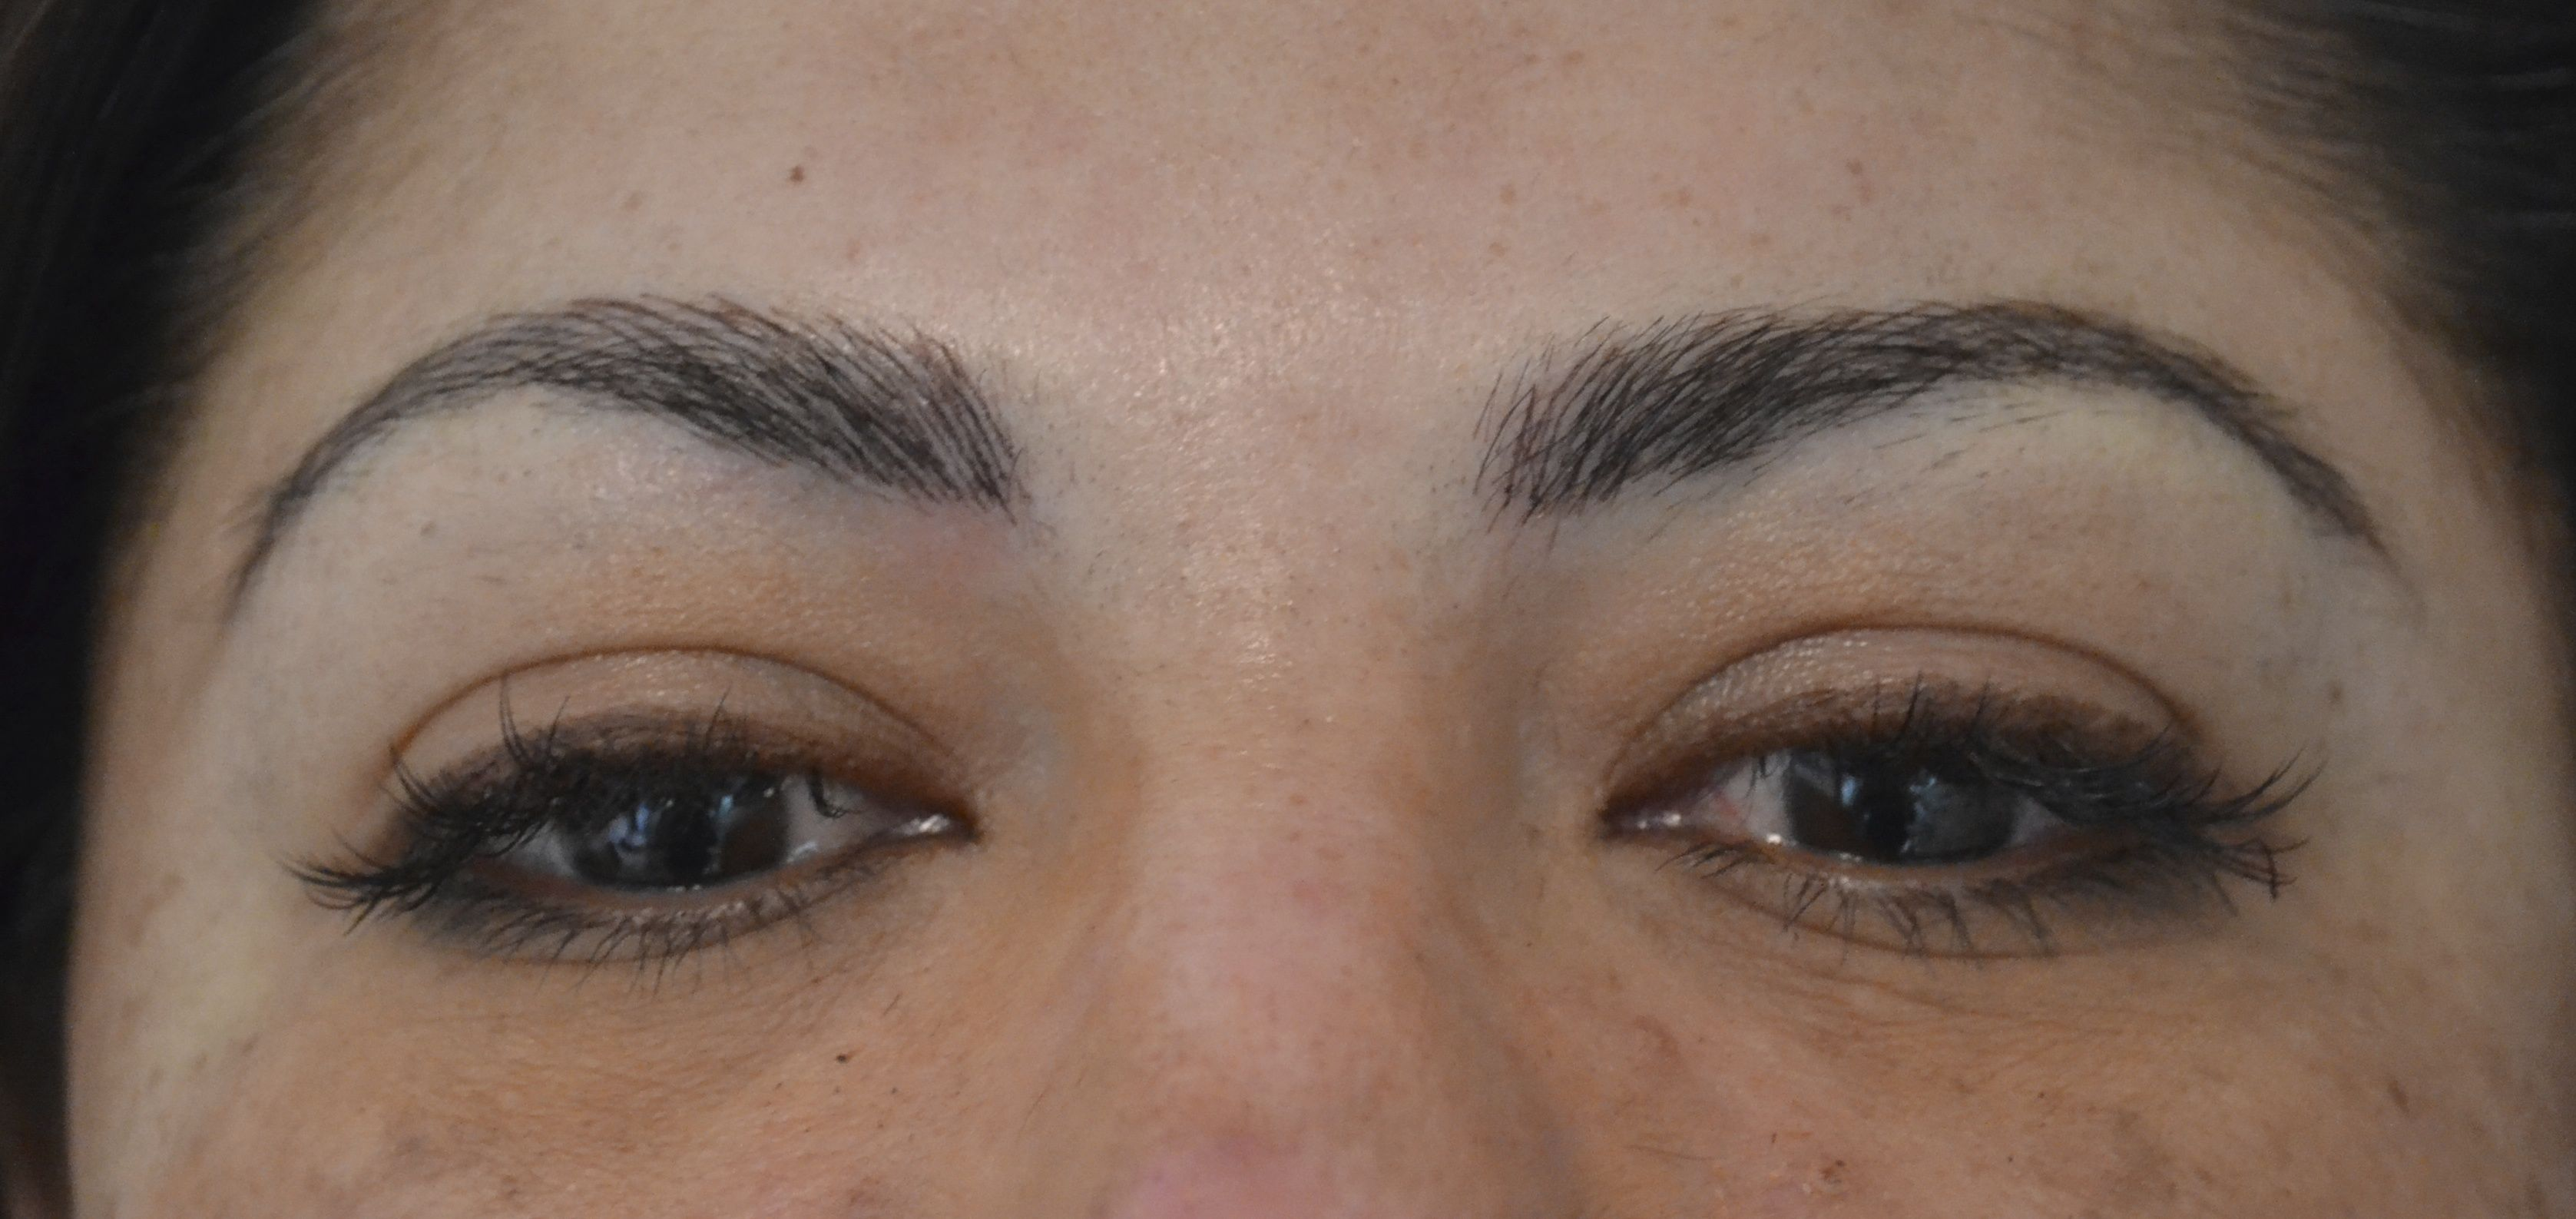 permanent eyebrow color, embroidery hair stroke technique ...